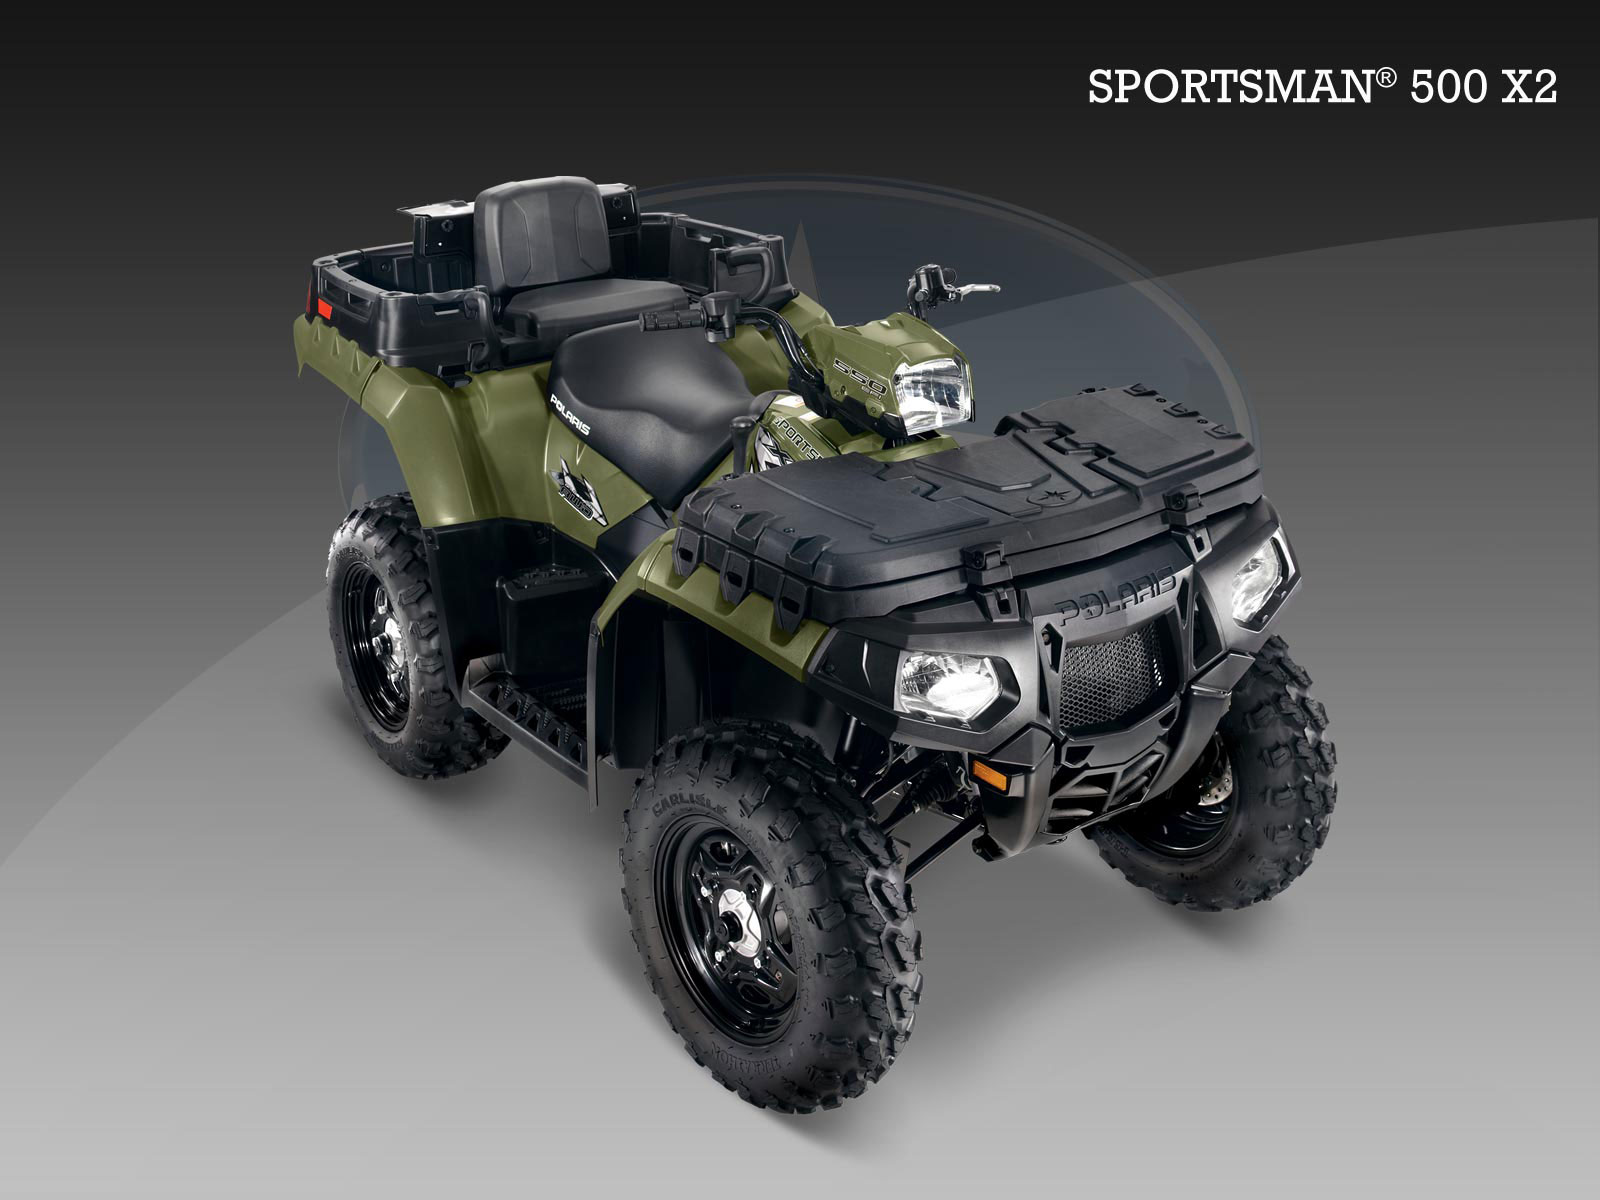 polaris sportsman 550 x2 specs 2009 2010 autoevolution. Black Bedroom Furniture Sets. Home Design Ideas